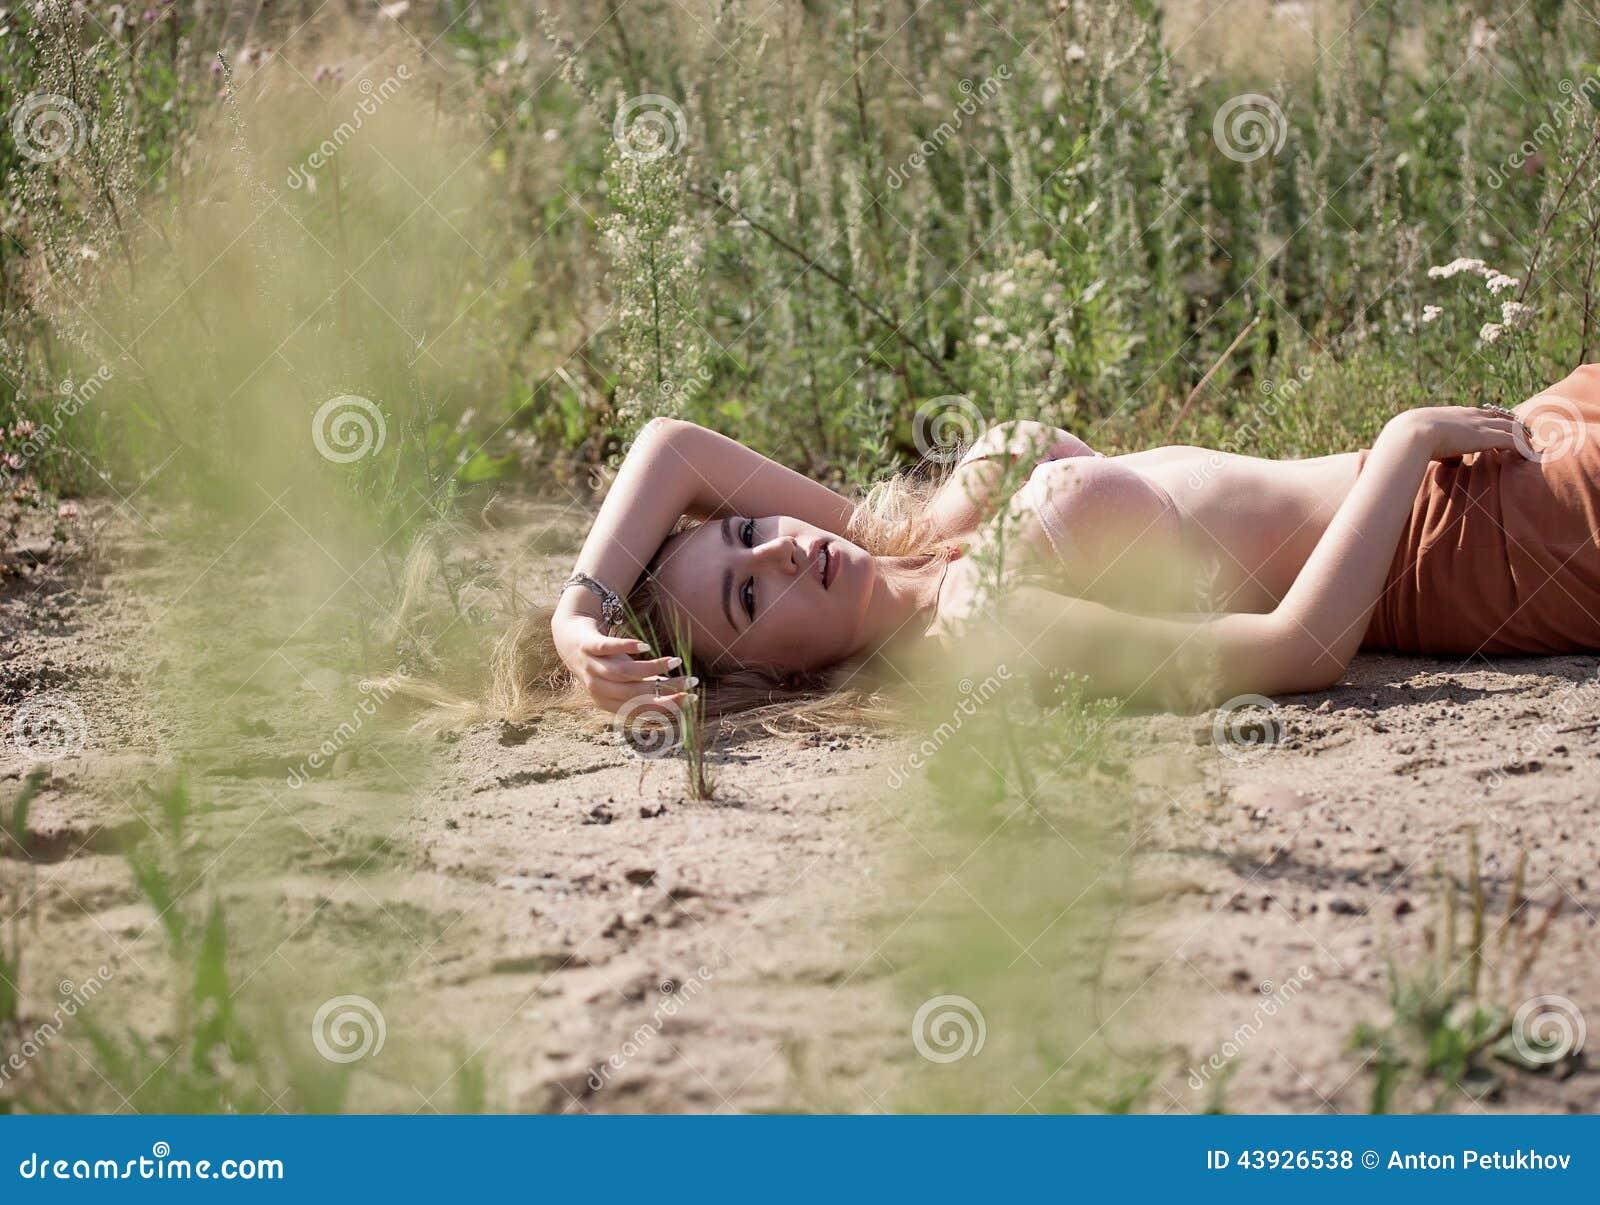 Girl with nice ass nude